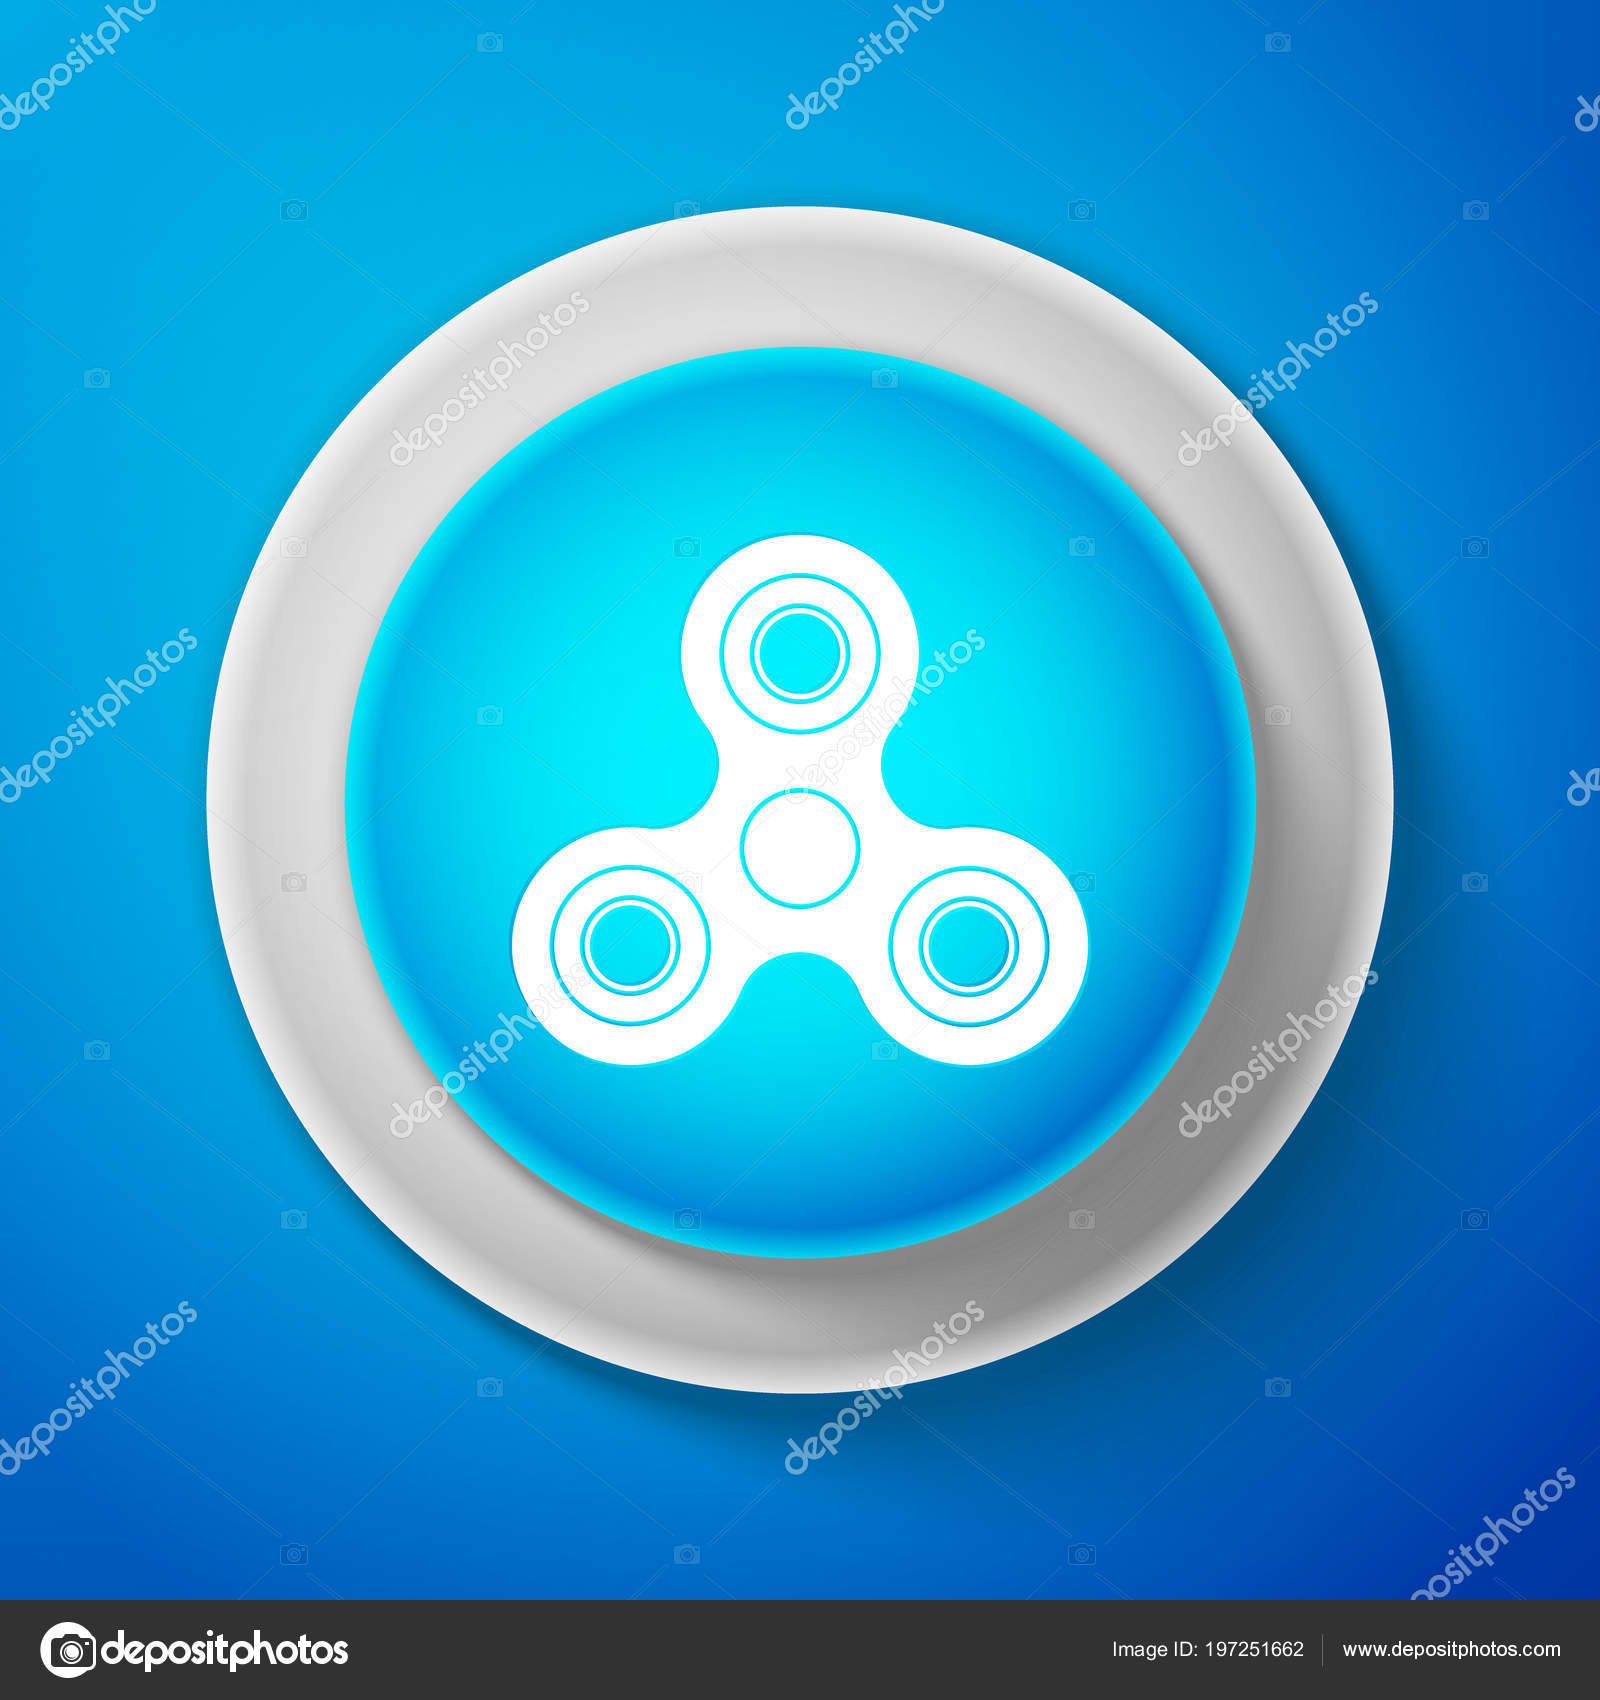 Fondo Sobre De AzulJuguete Spinner Aislado Blanco Icono Fidget bv7f6gyY